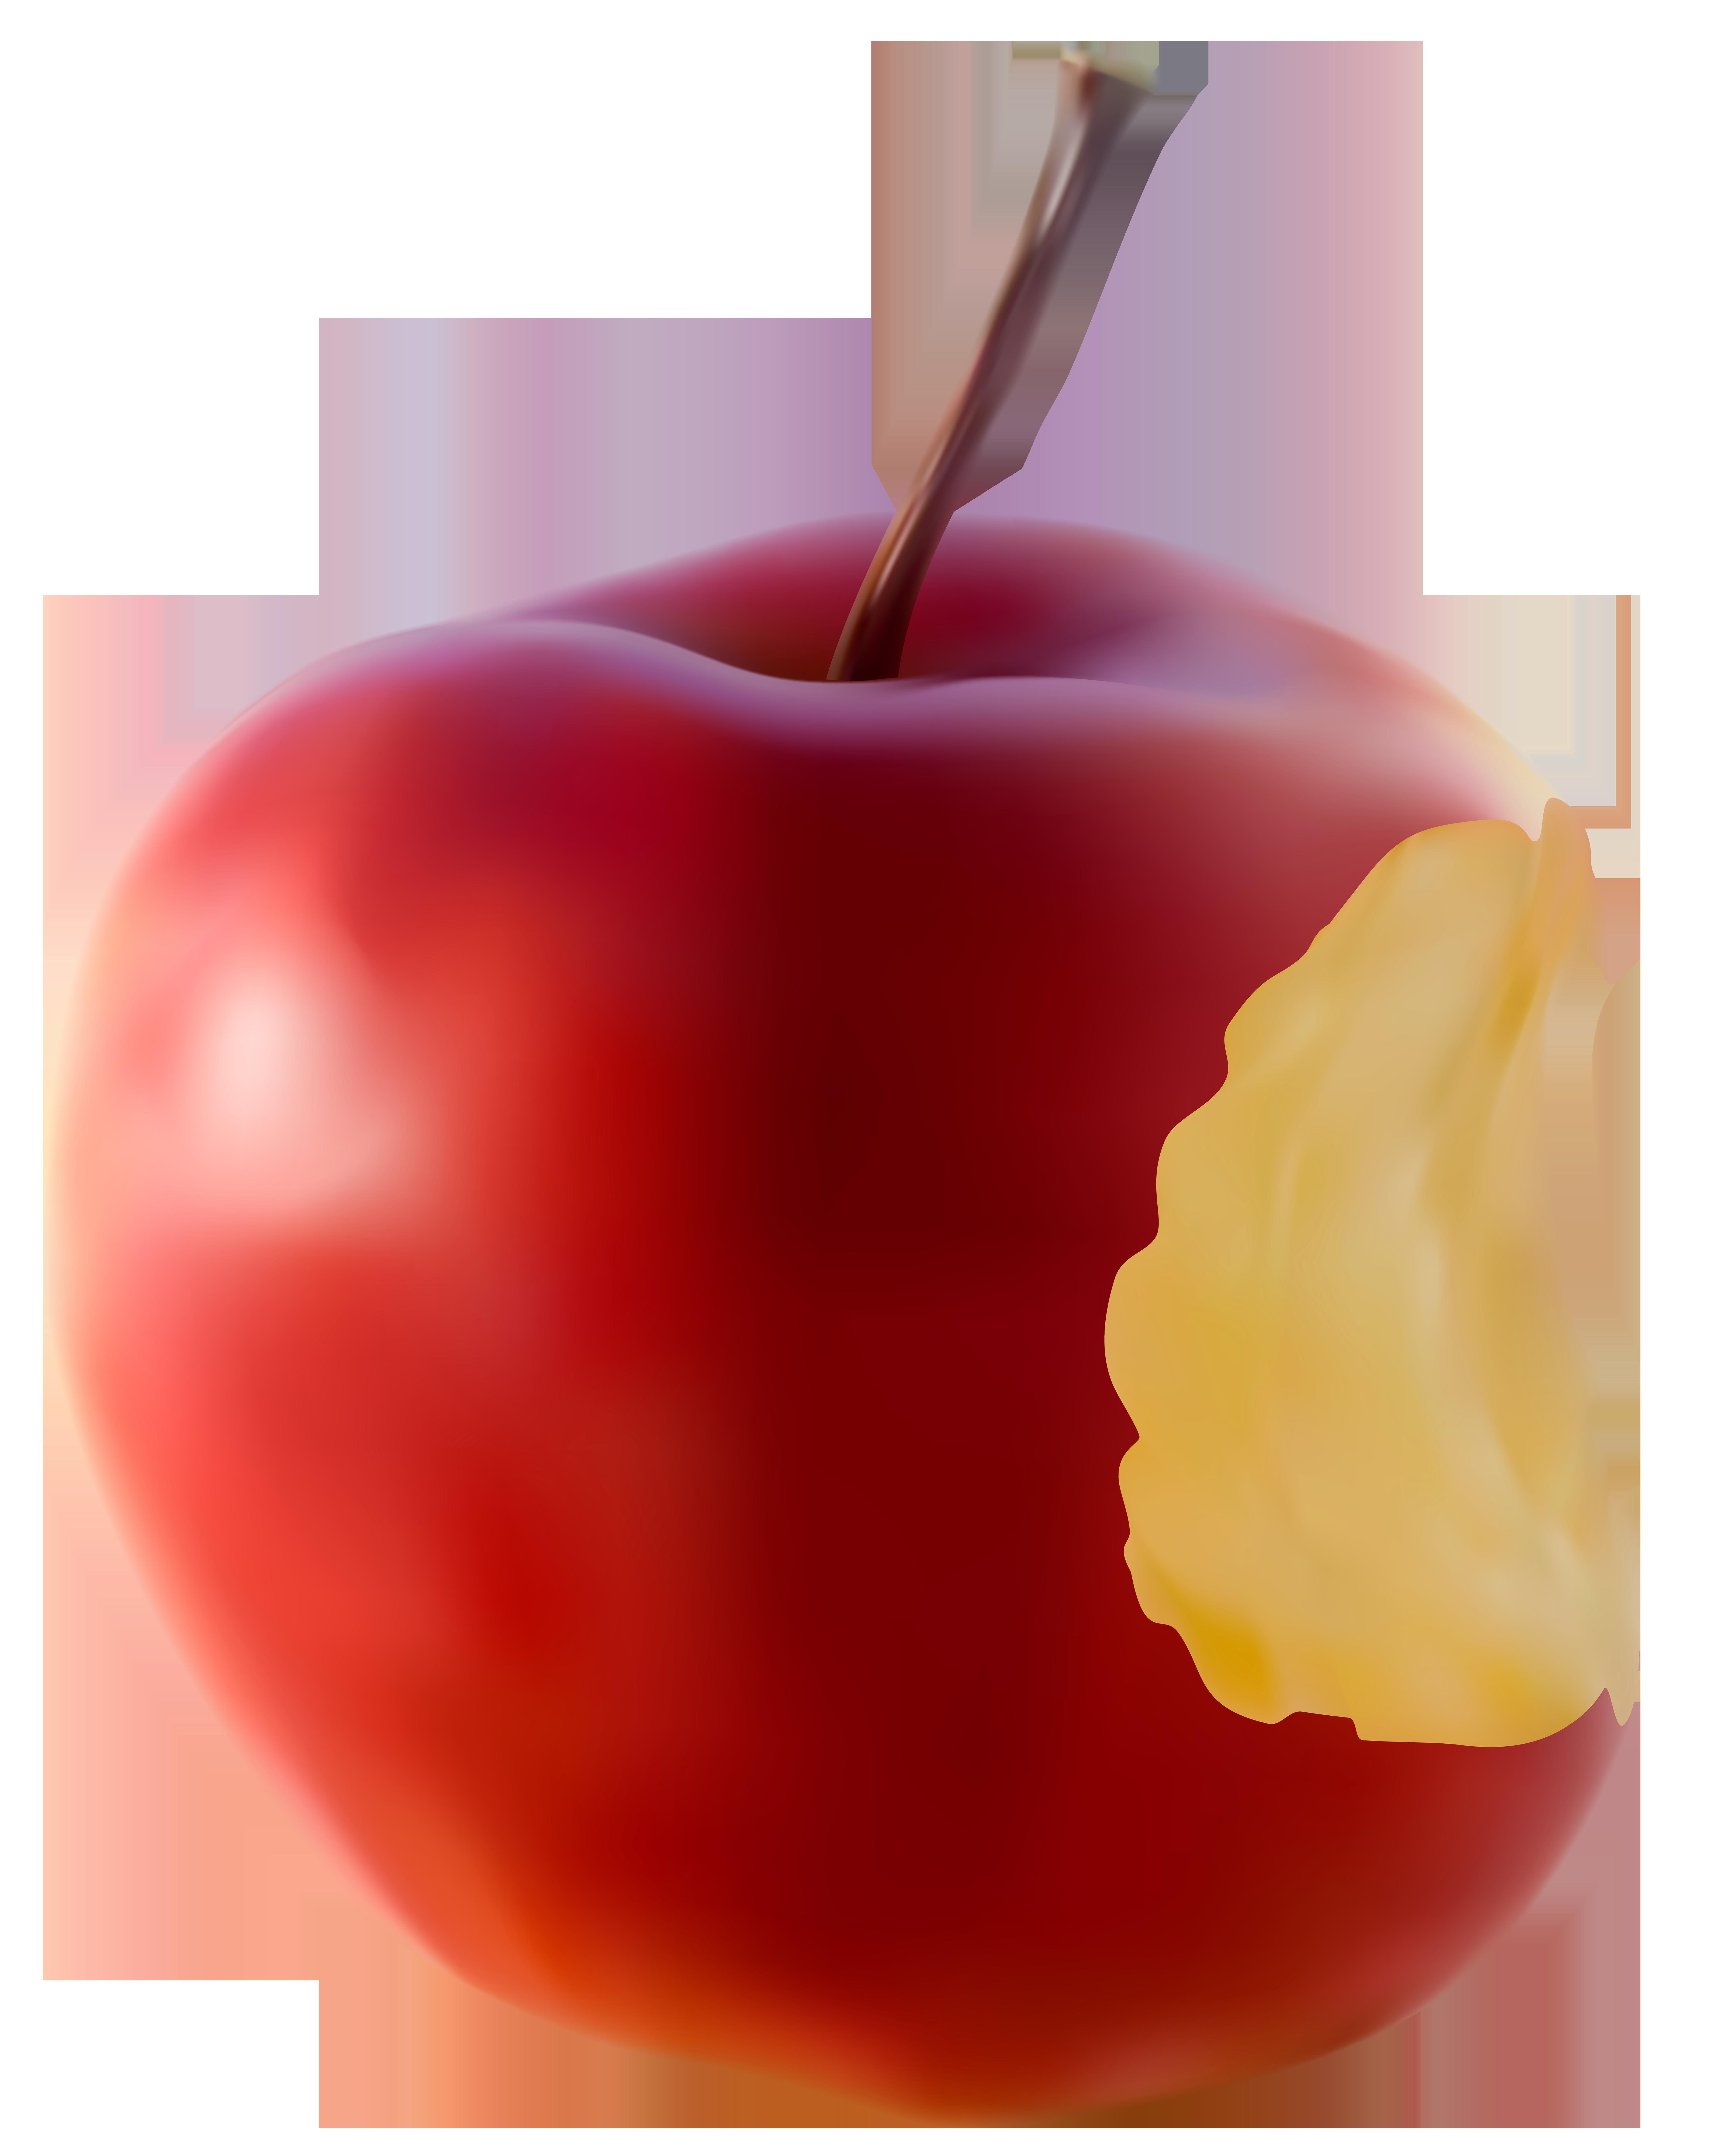 Apple bite clipart freeuse Bitten Apple Red Transparent Clip Art Image | Gallery Yopriceville ... freeuse